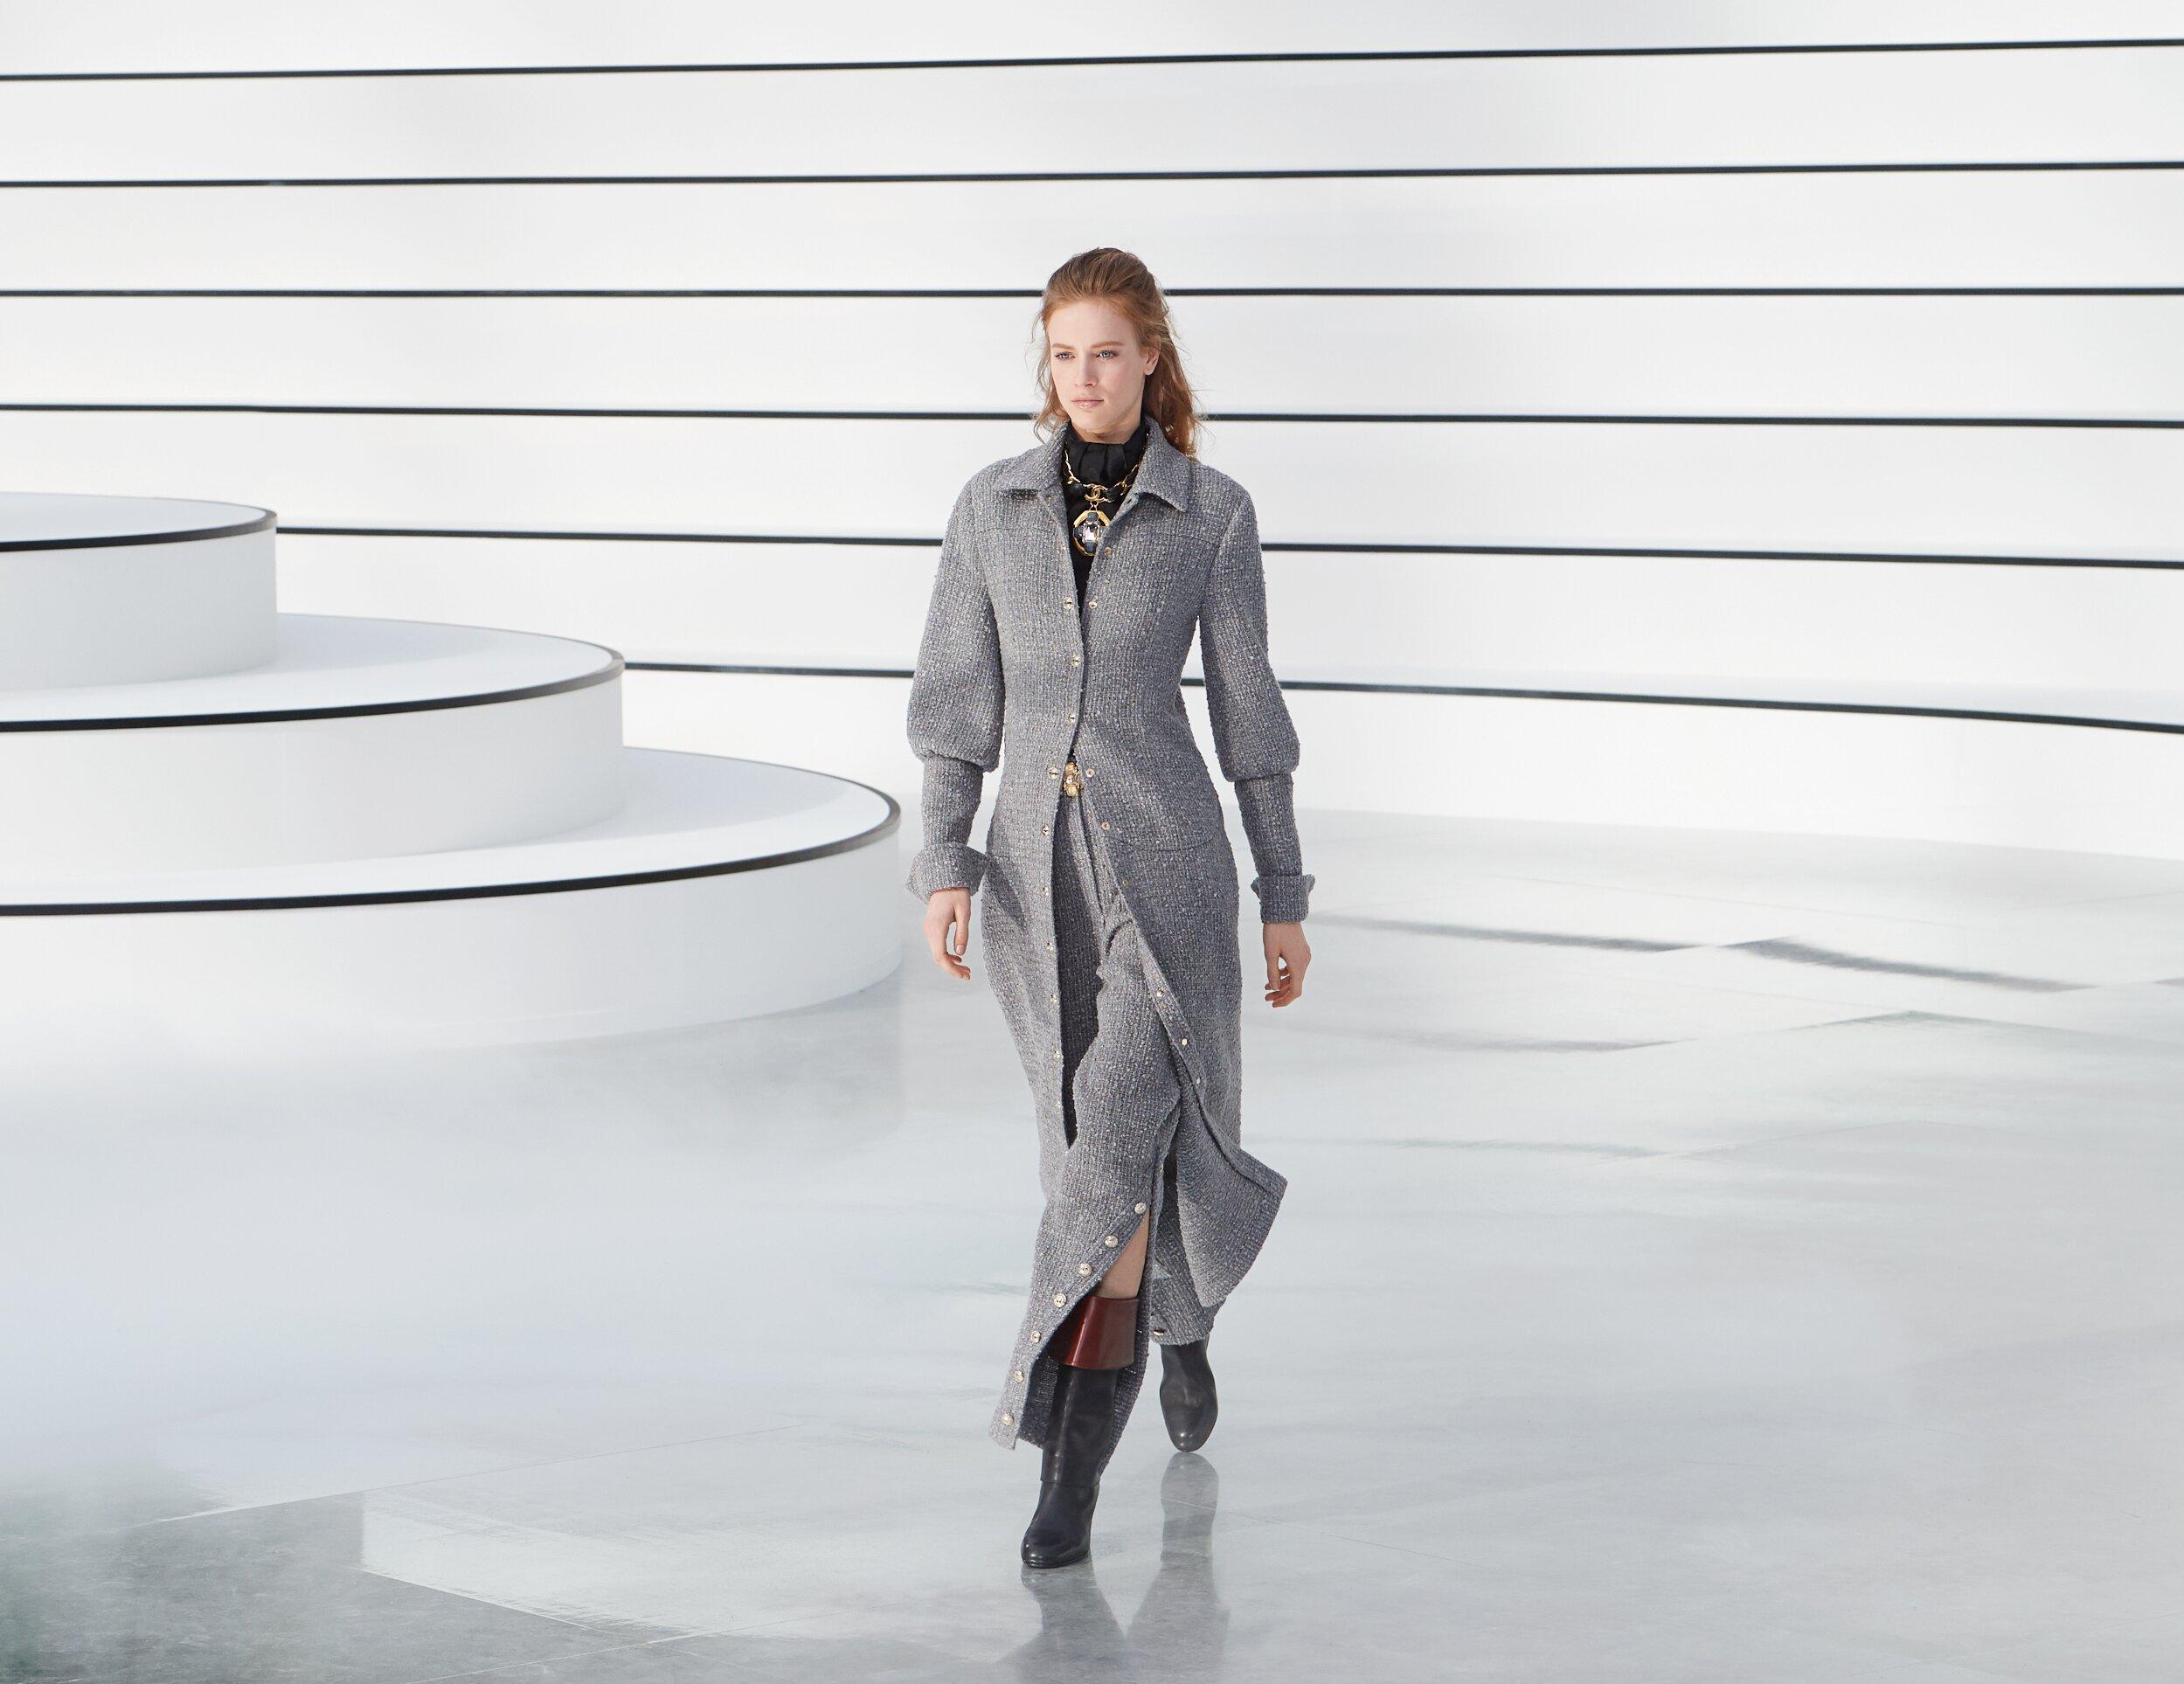 Chanel Fall 2020 Catwalk